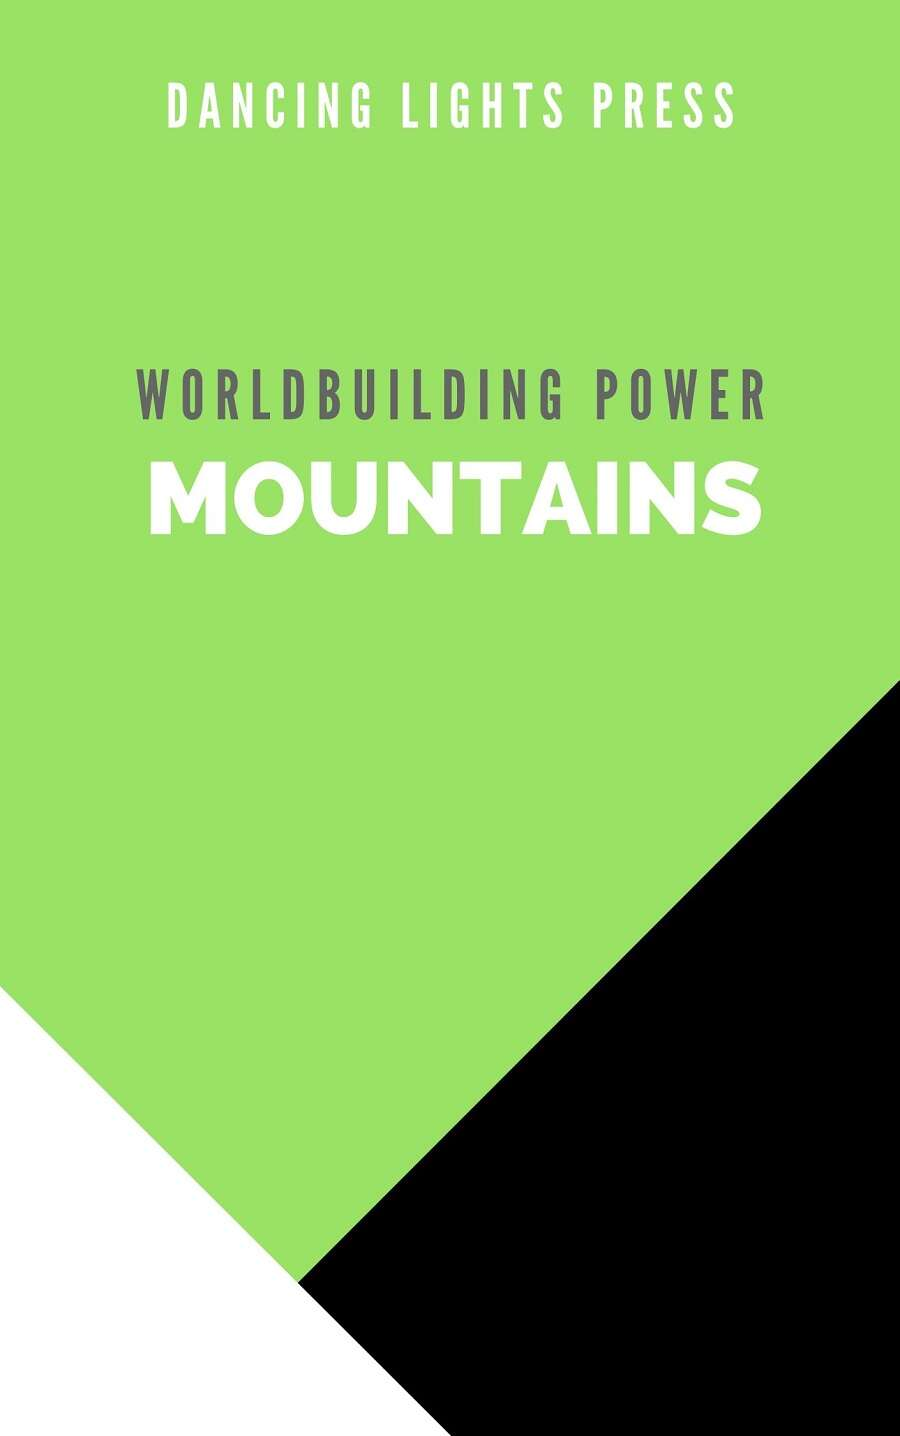 Worldbuilding Power: Mountains